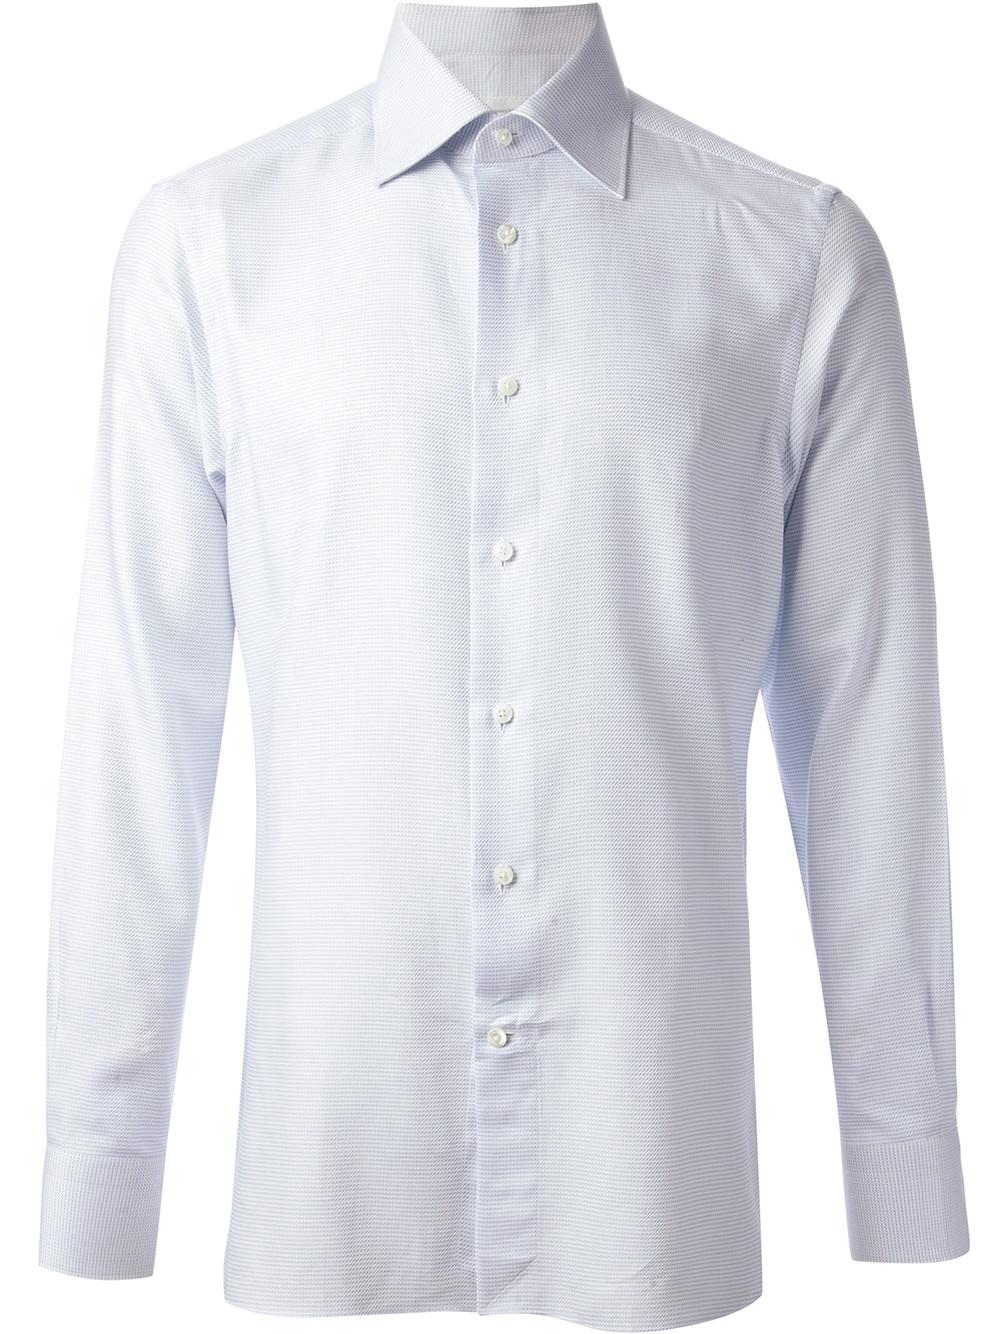 ermenegildo zegna pointed collared shirt in white for men lyst. Black Bedroom Furniture Sets. Home Design Ideas